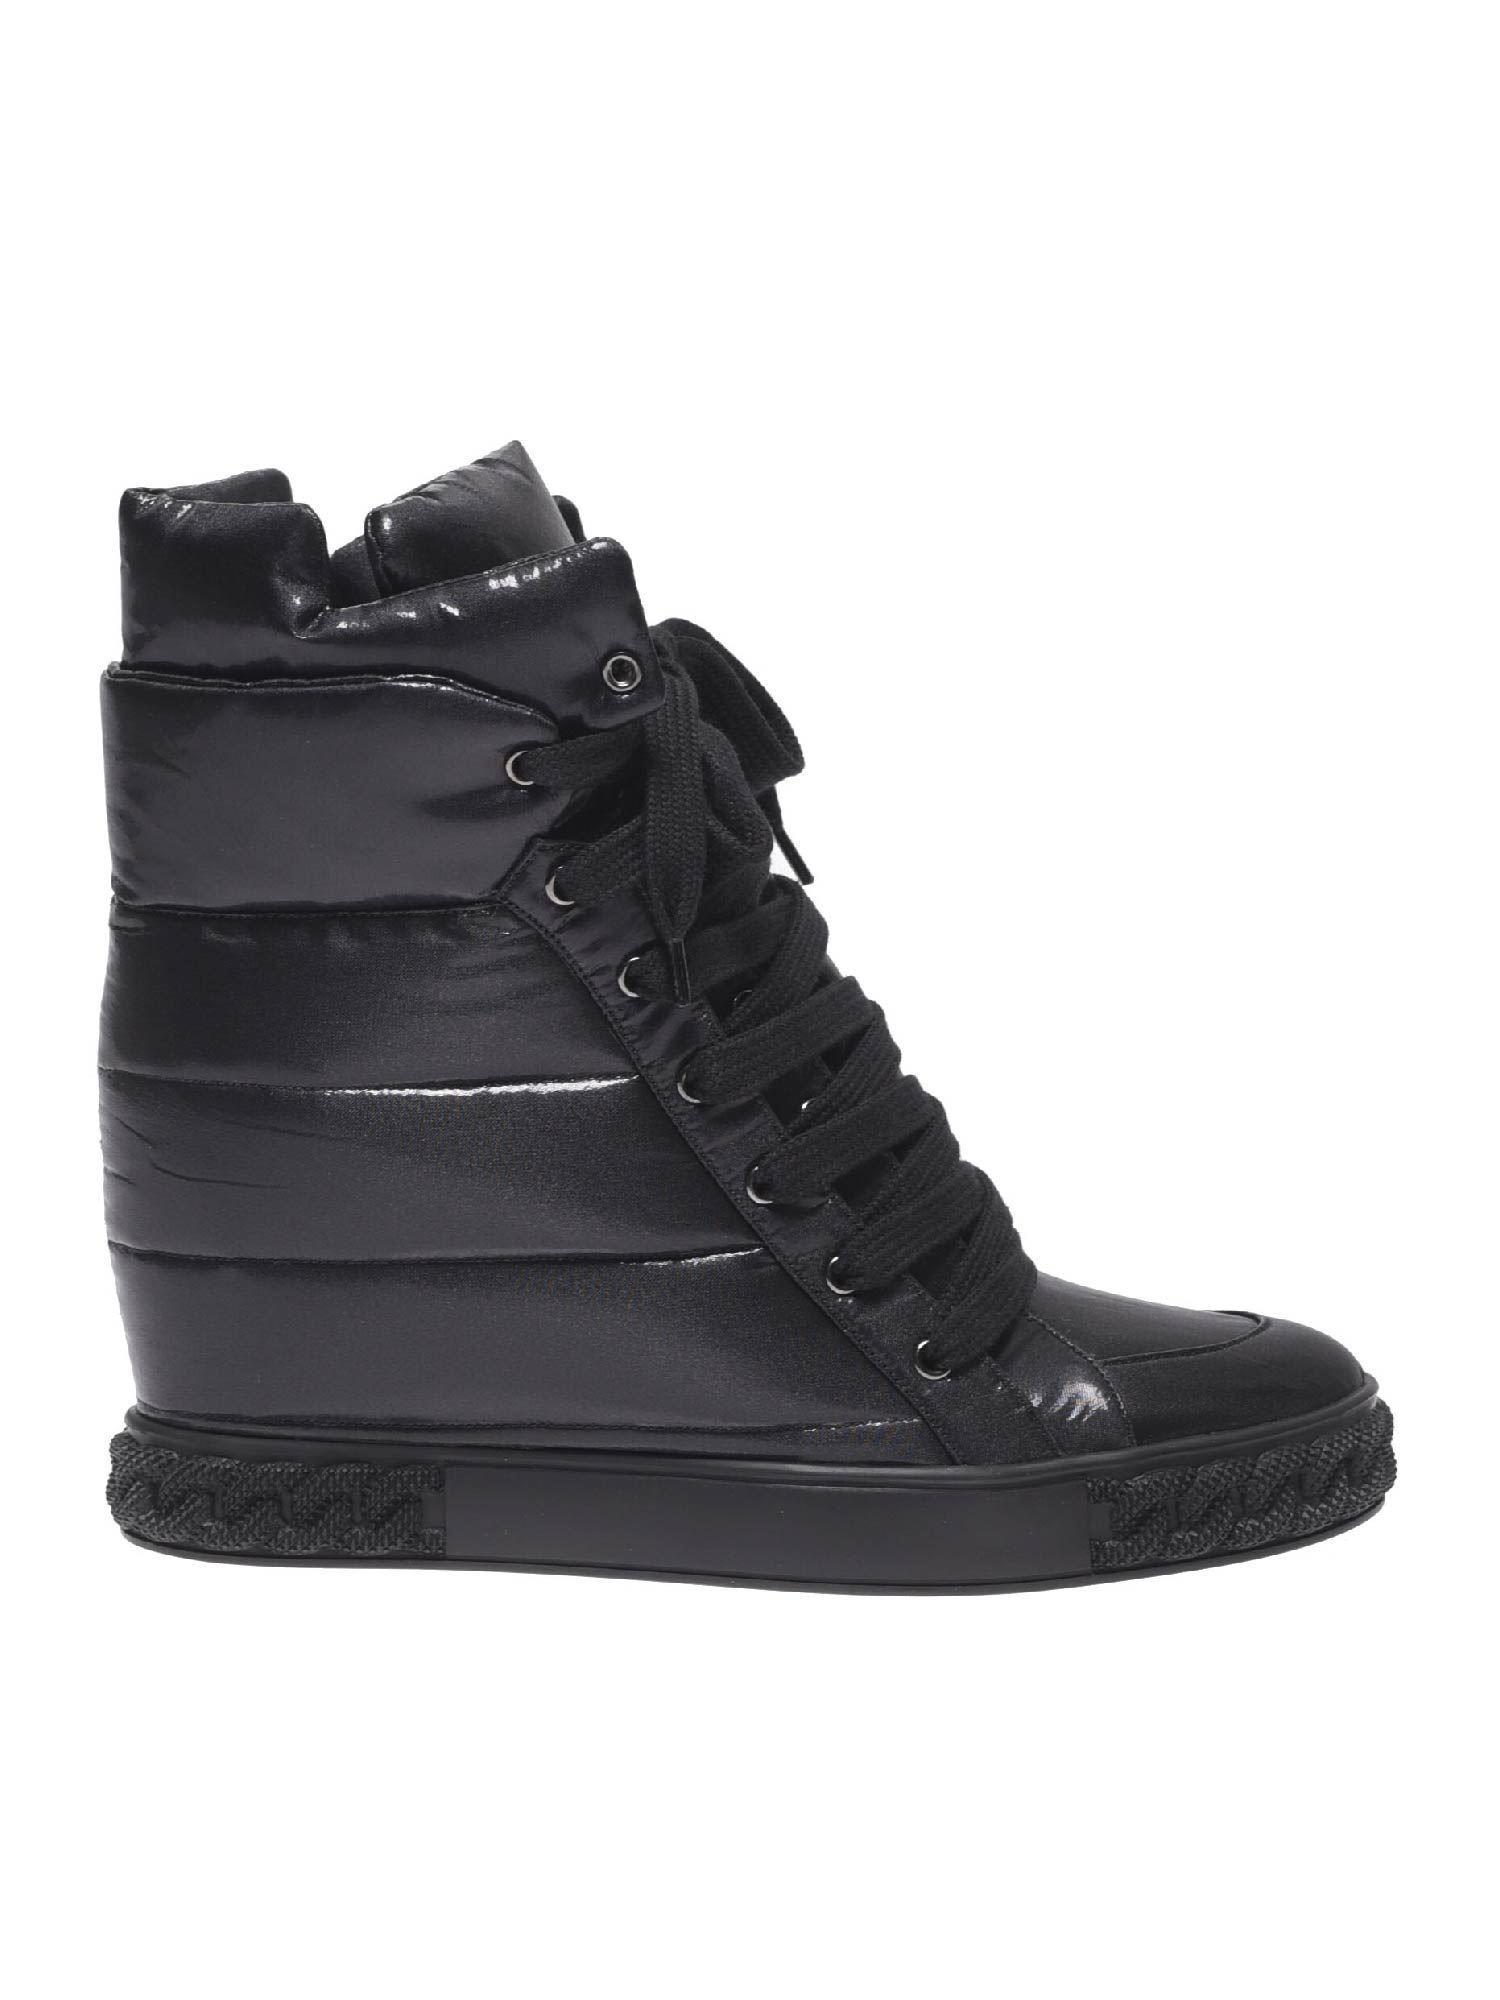 5c06f58df3a Casadei Black Sneaker With Inner Wedge in Black - Lyst